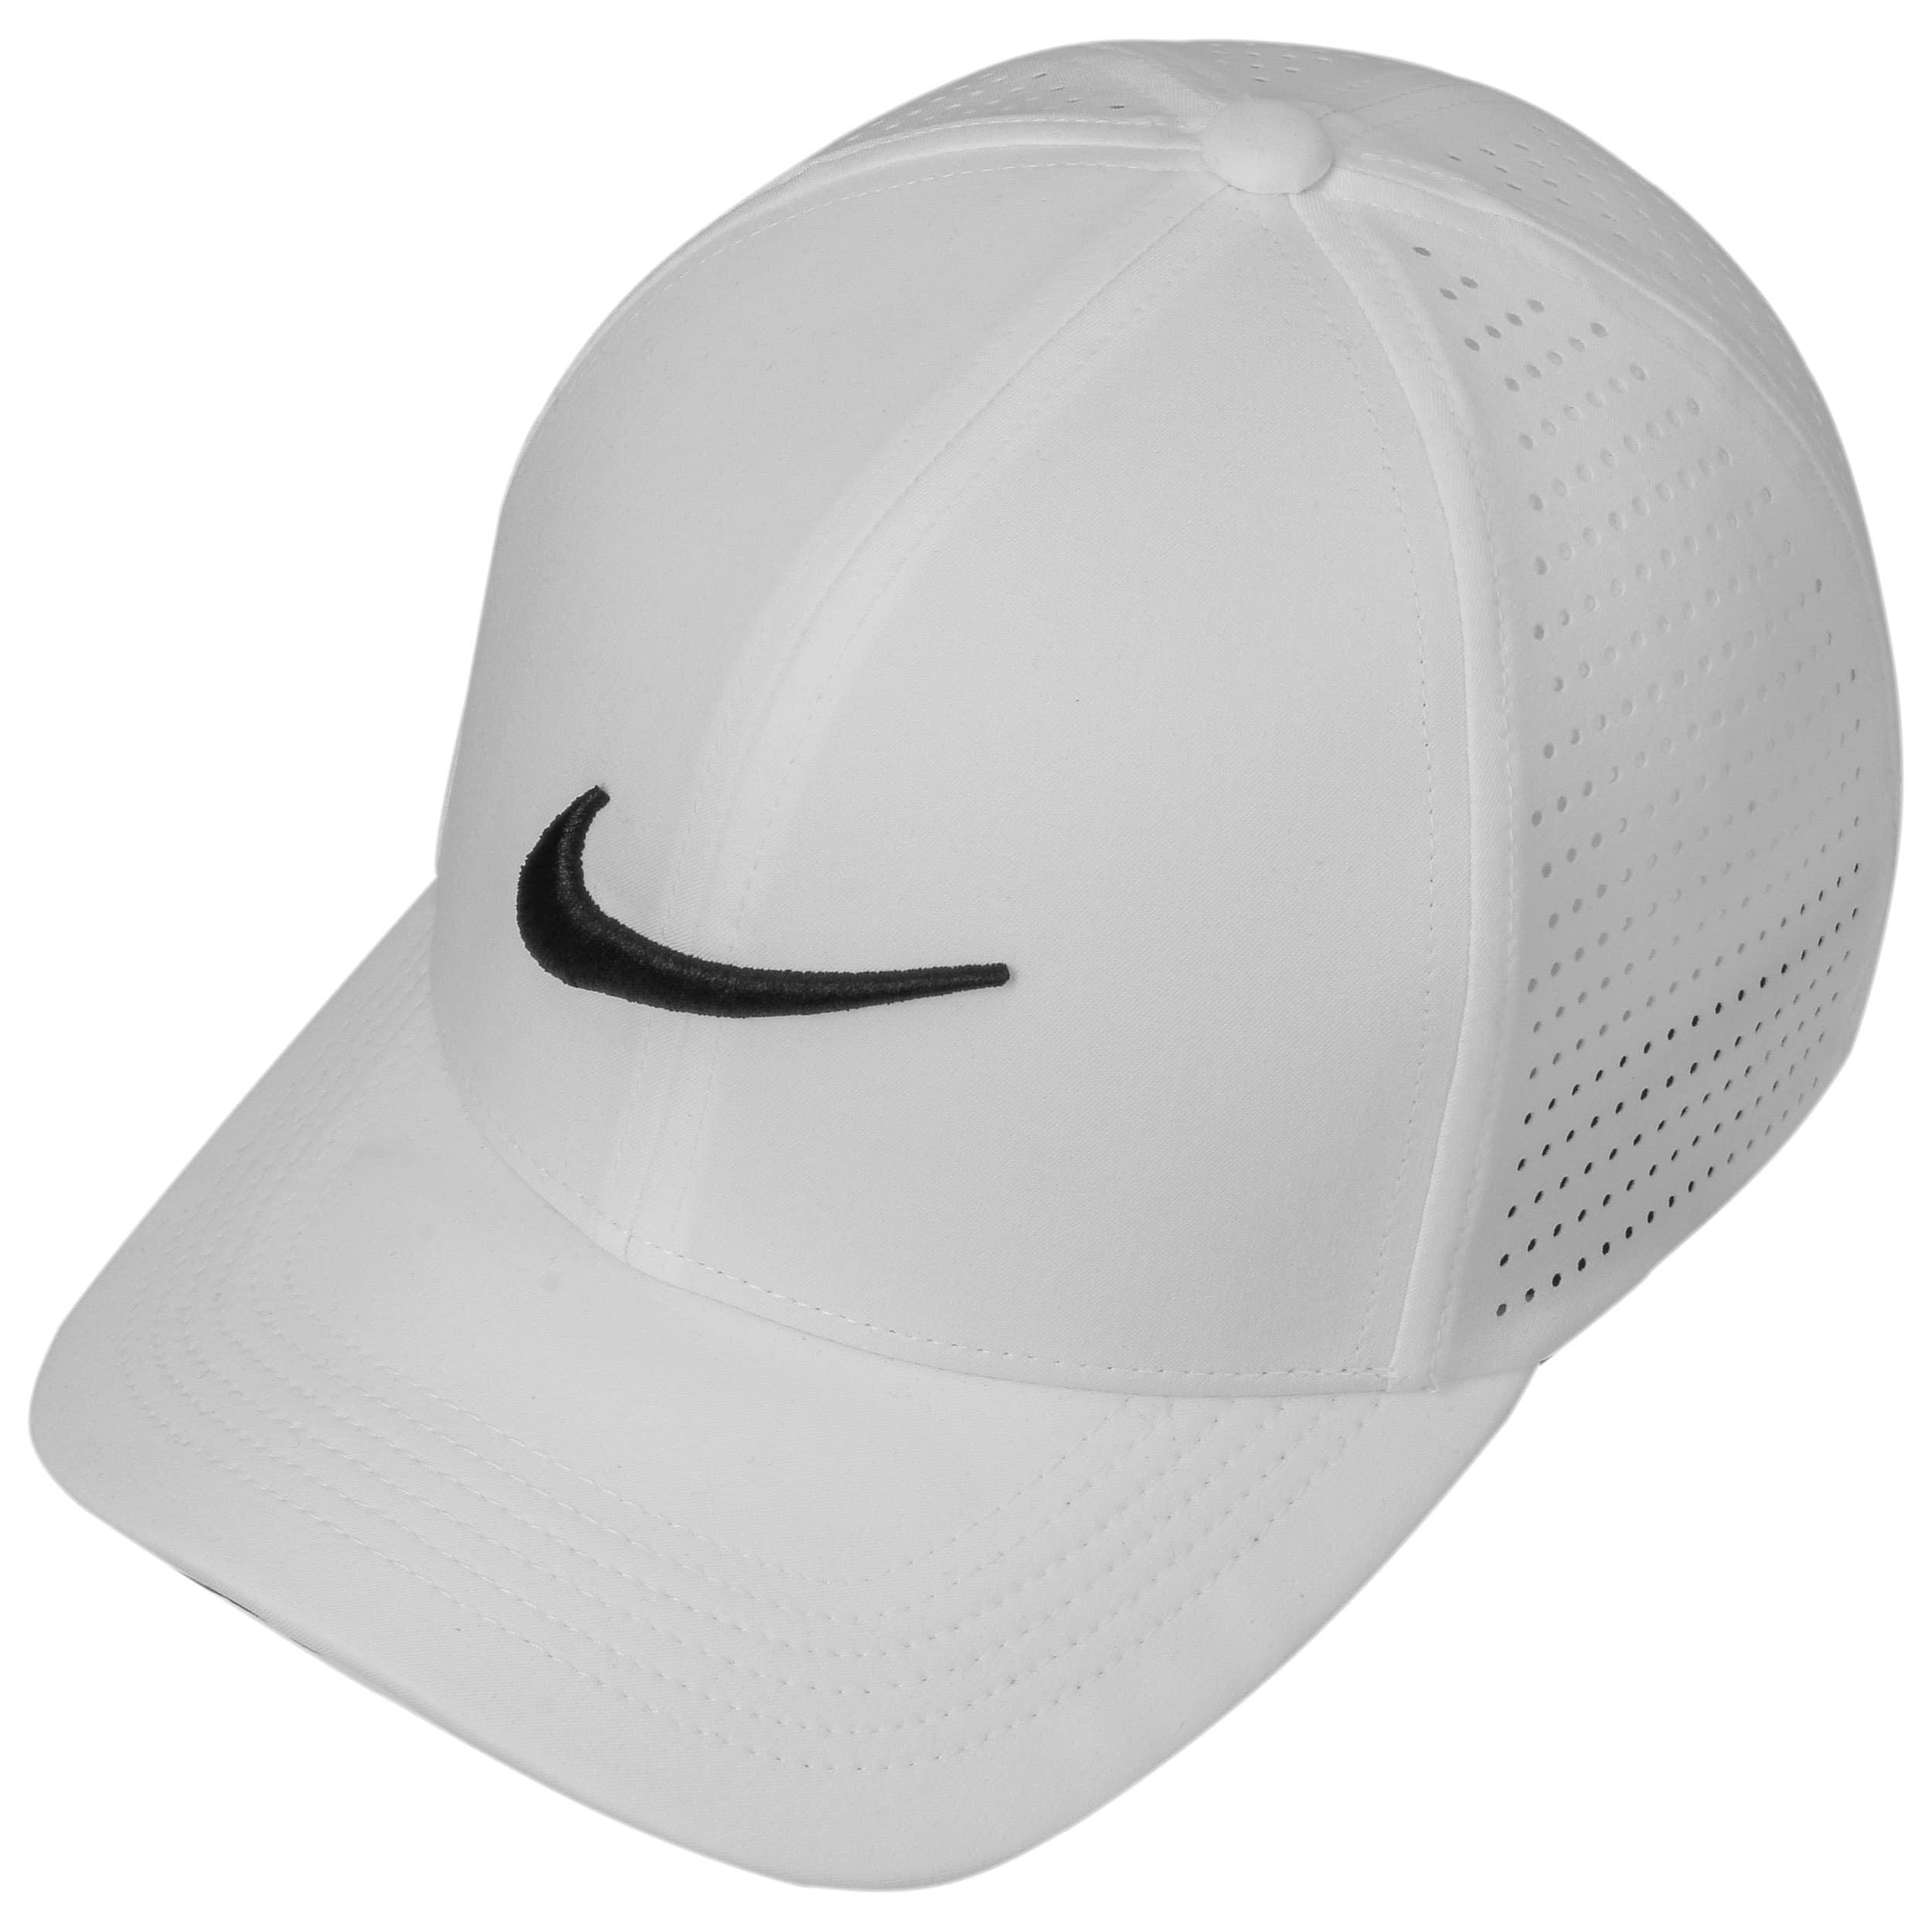 ... amarillo neón 1 · Gorra Golf Classic 99 Baseball by Nike - blanco 1 ... 20a3058bfd9